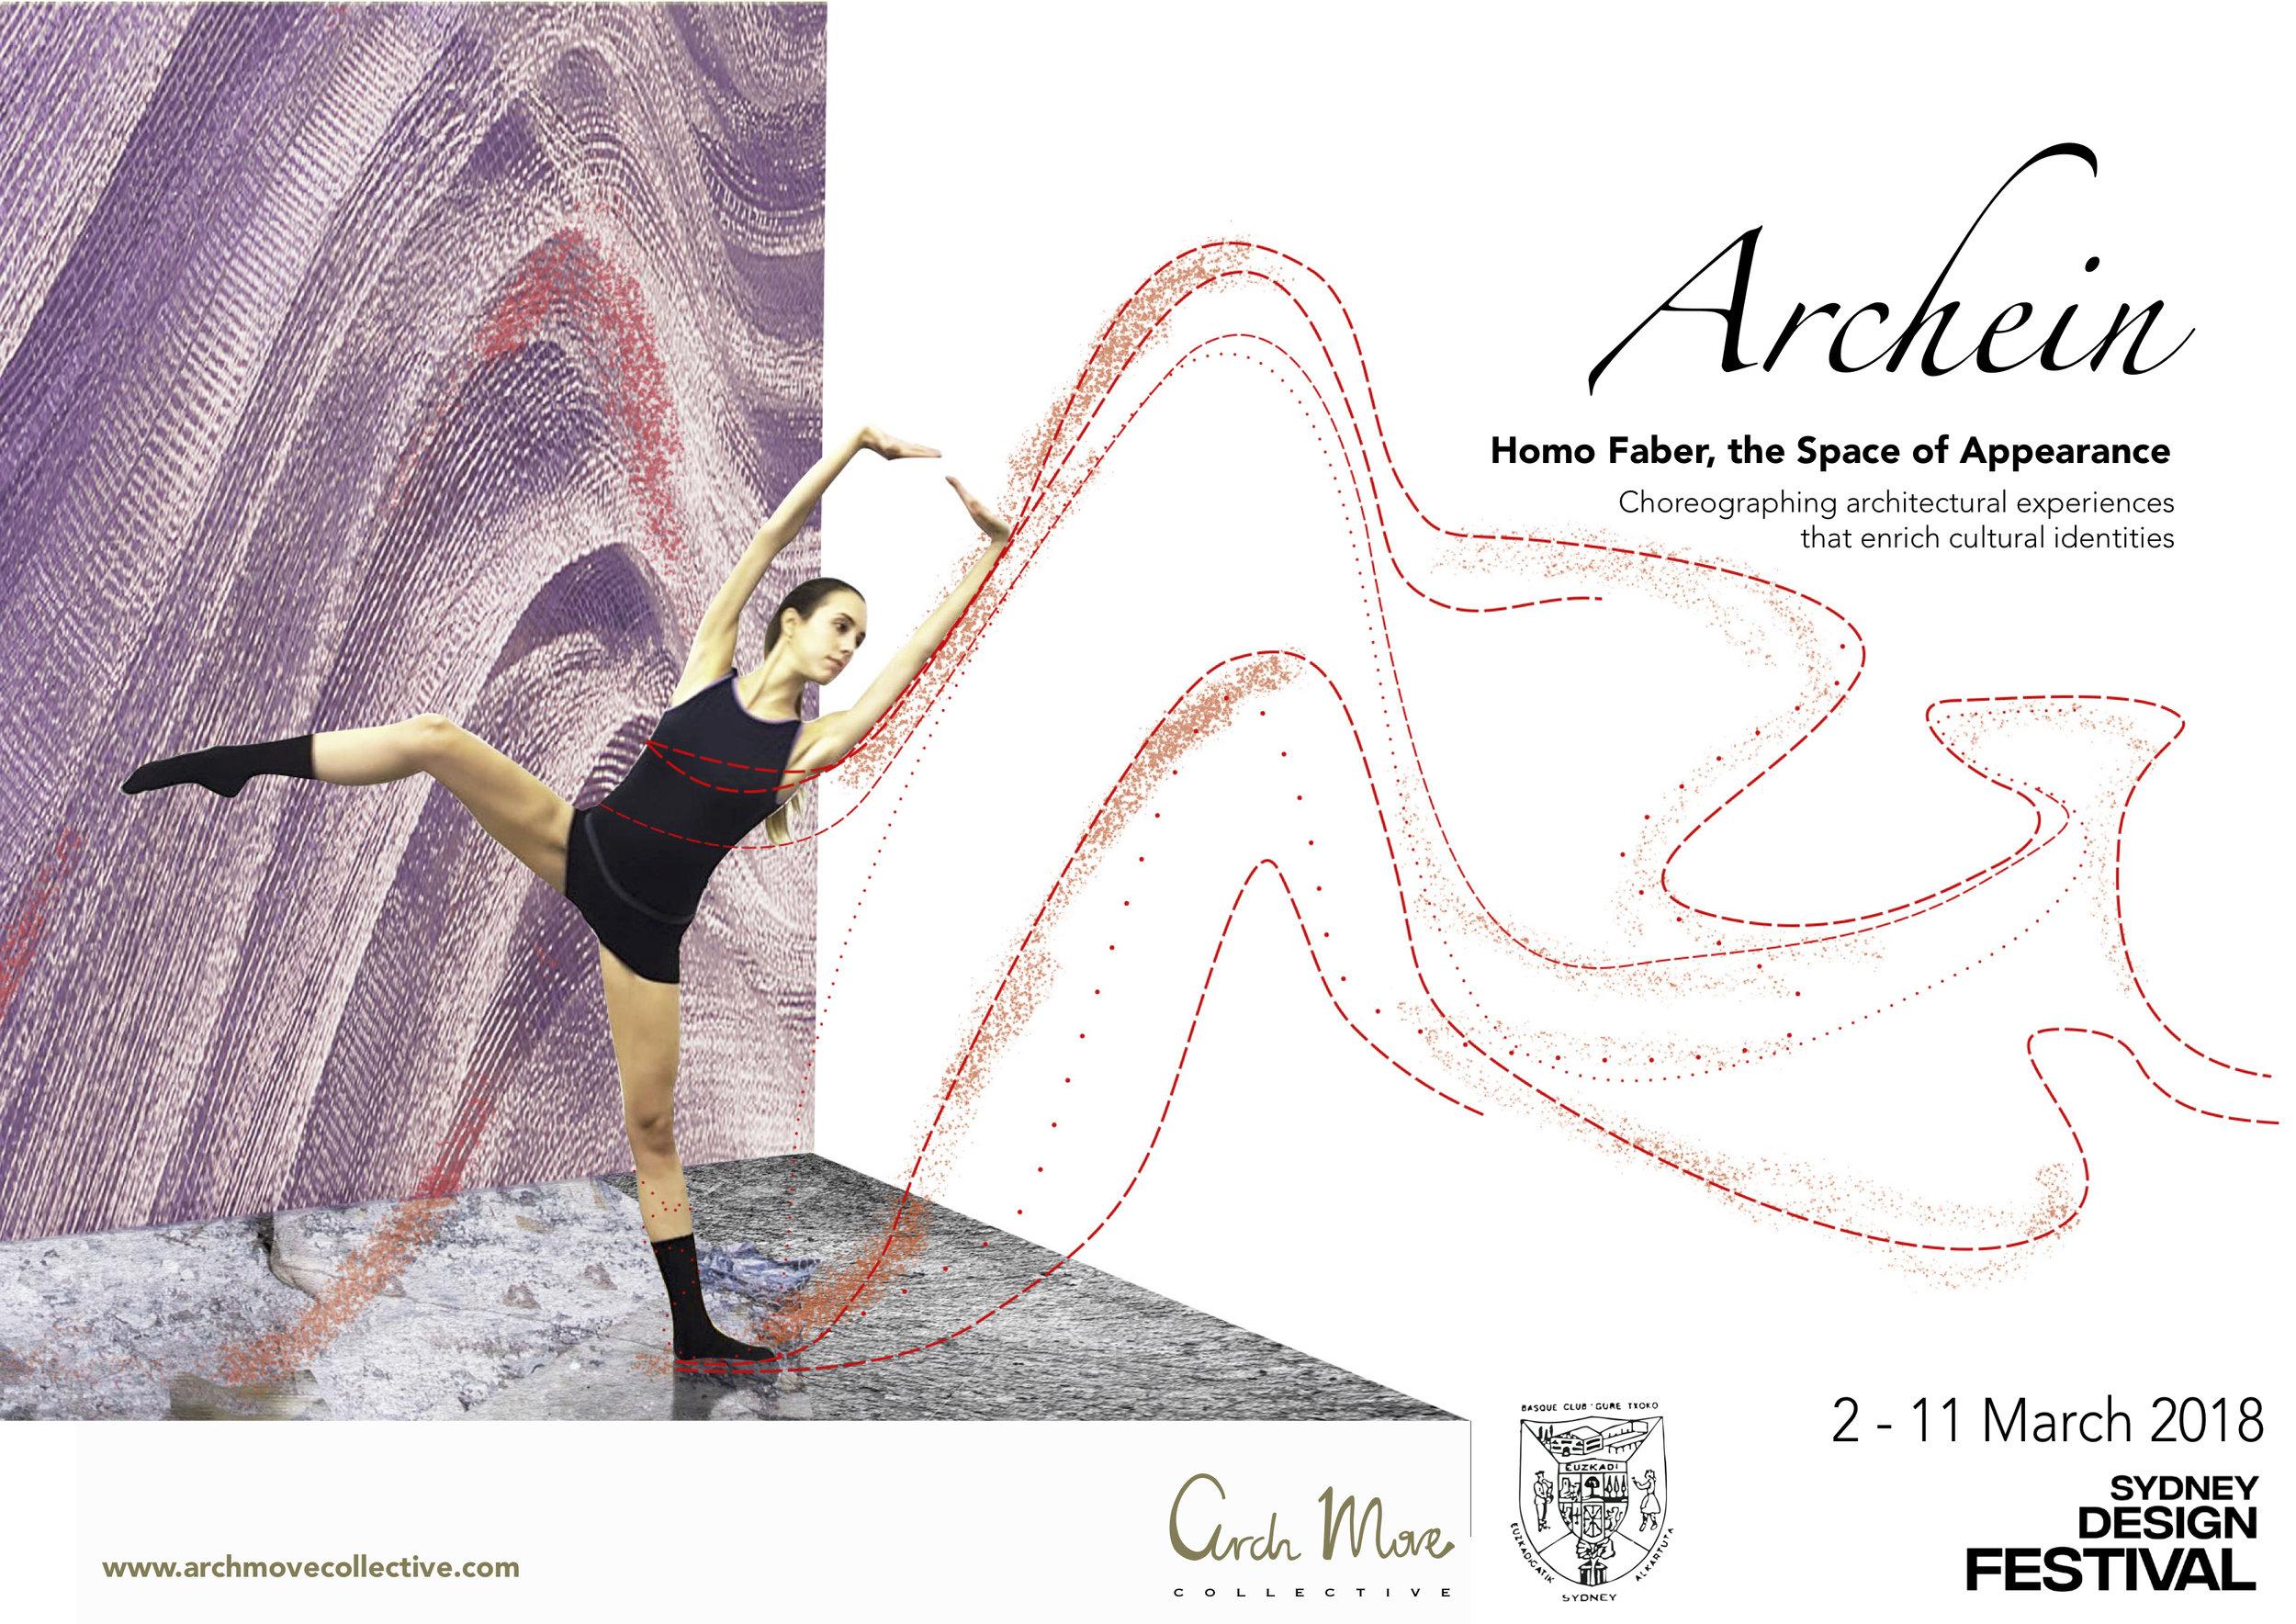 Sydney Design Festival_Archein_ArchMove Collective_Catalogue English.jpg